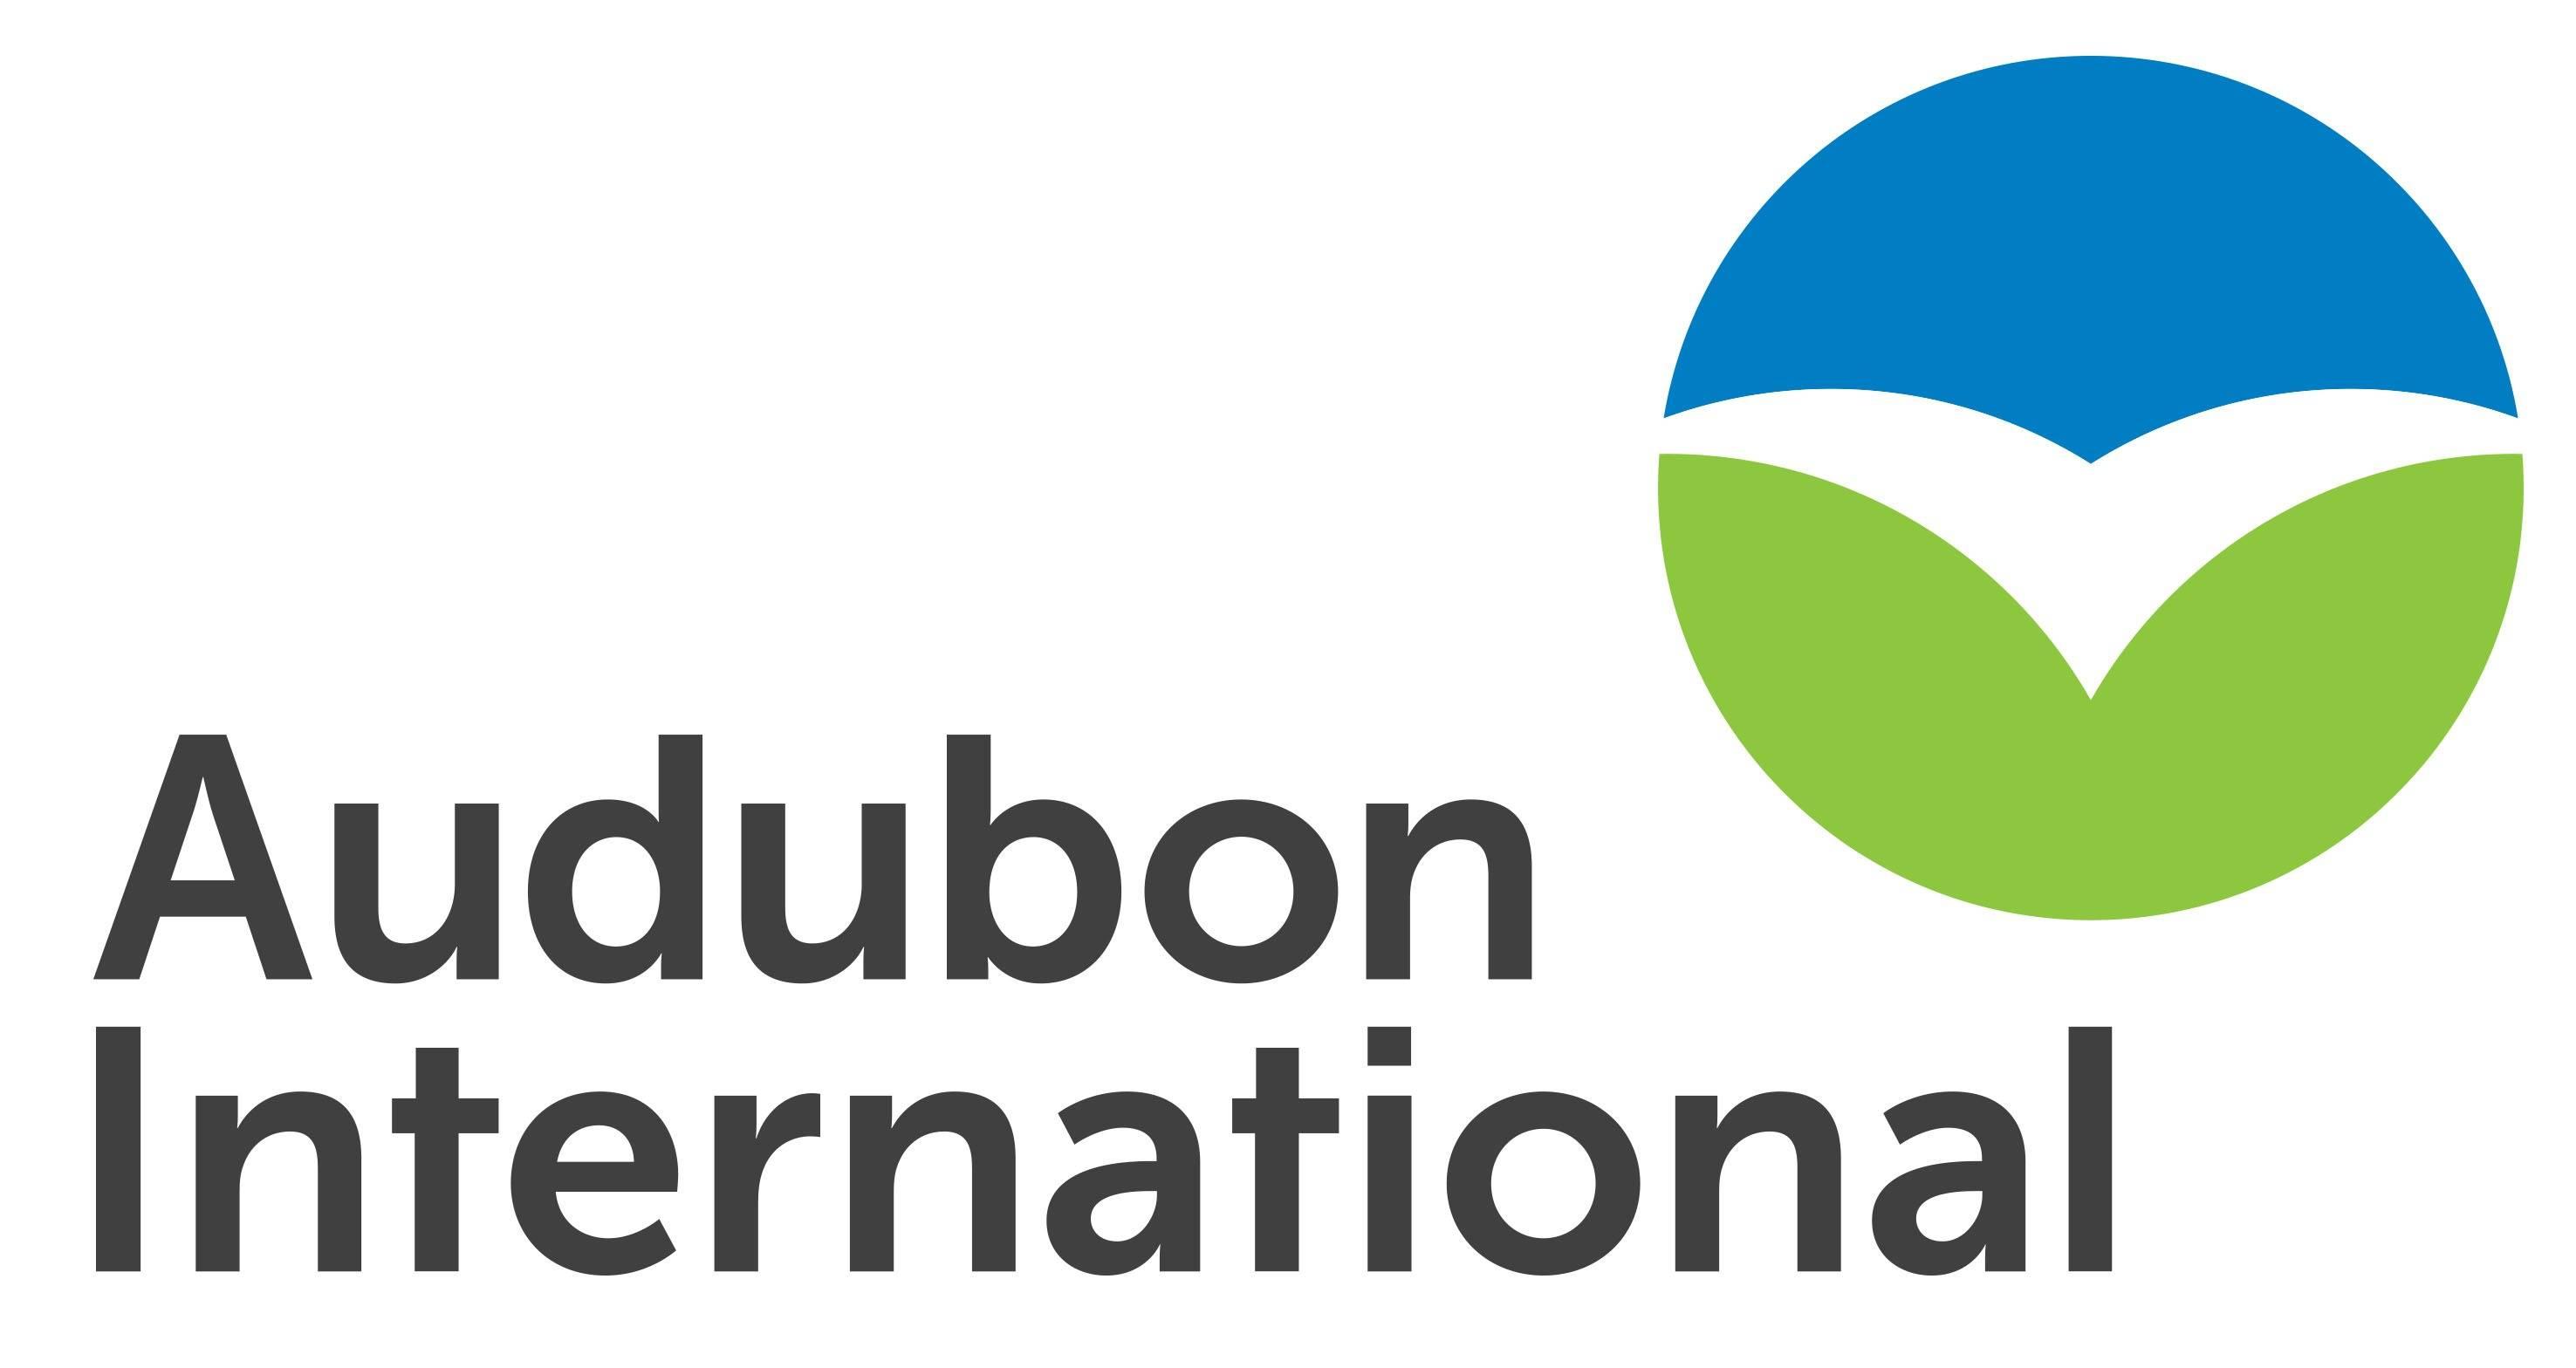 Logo of Audubon International